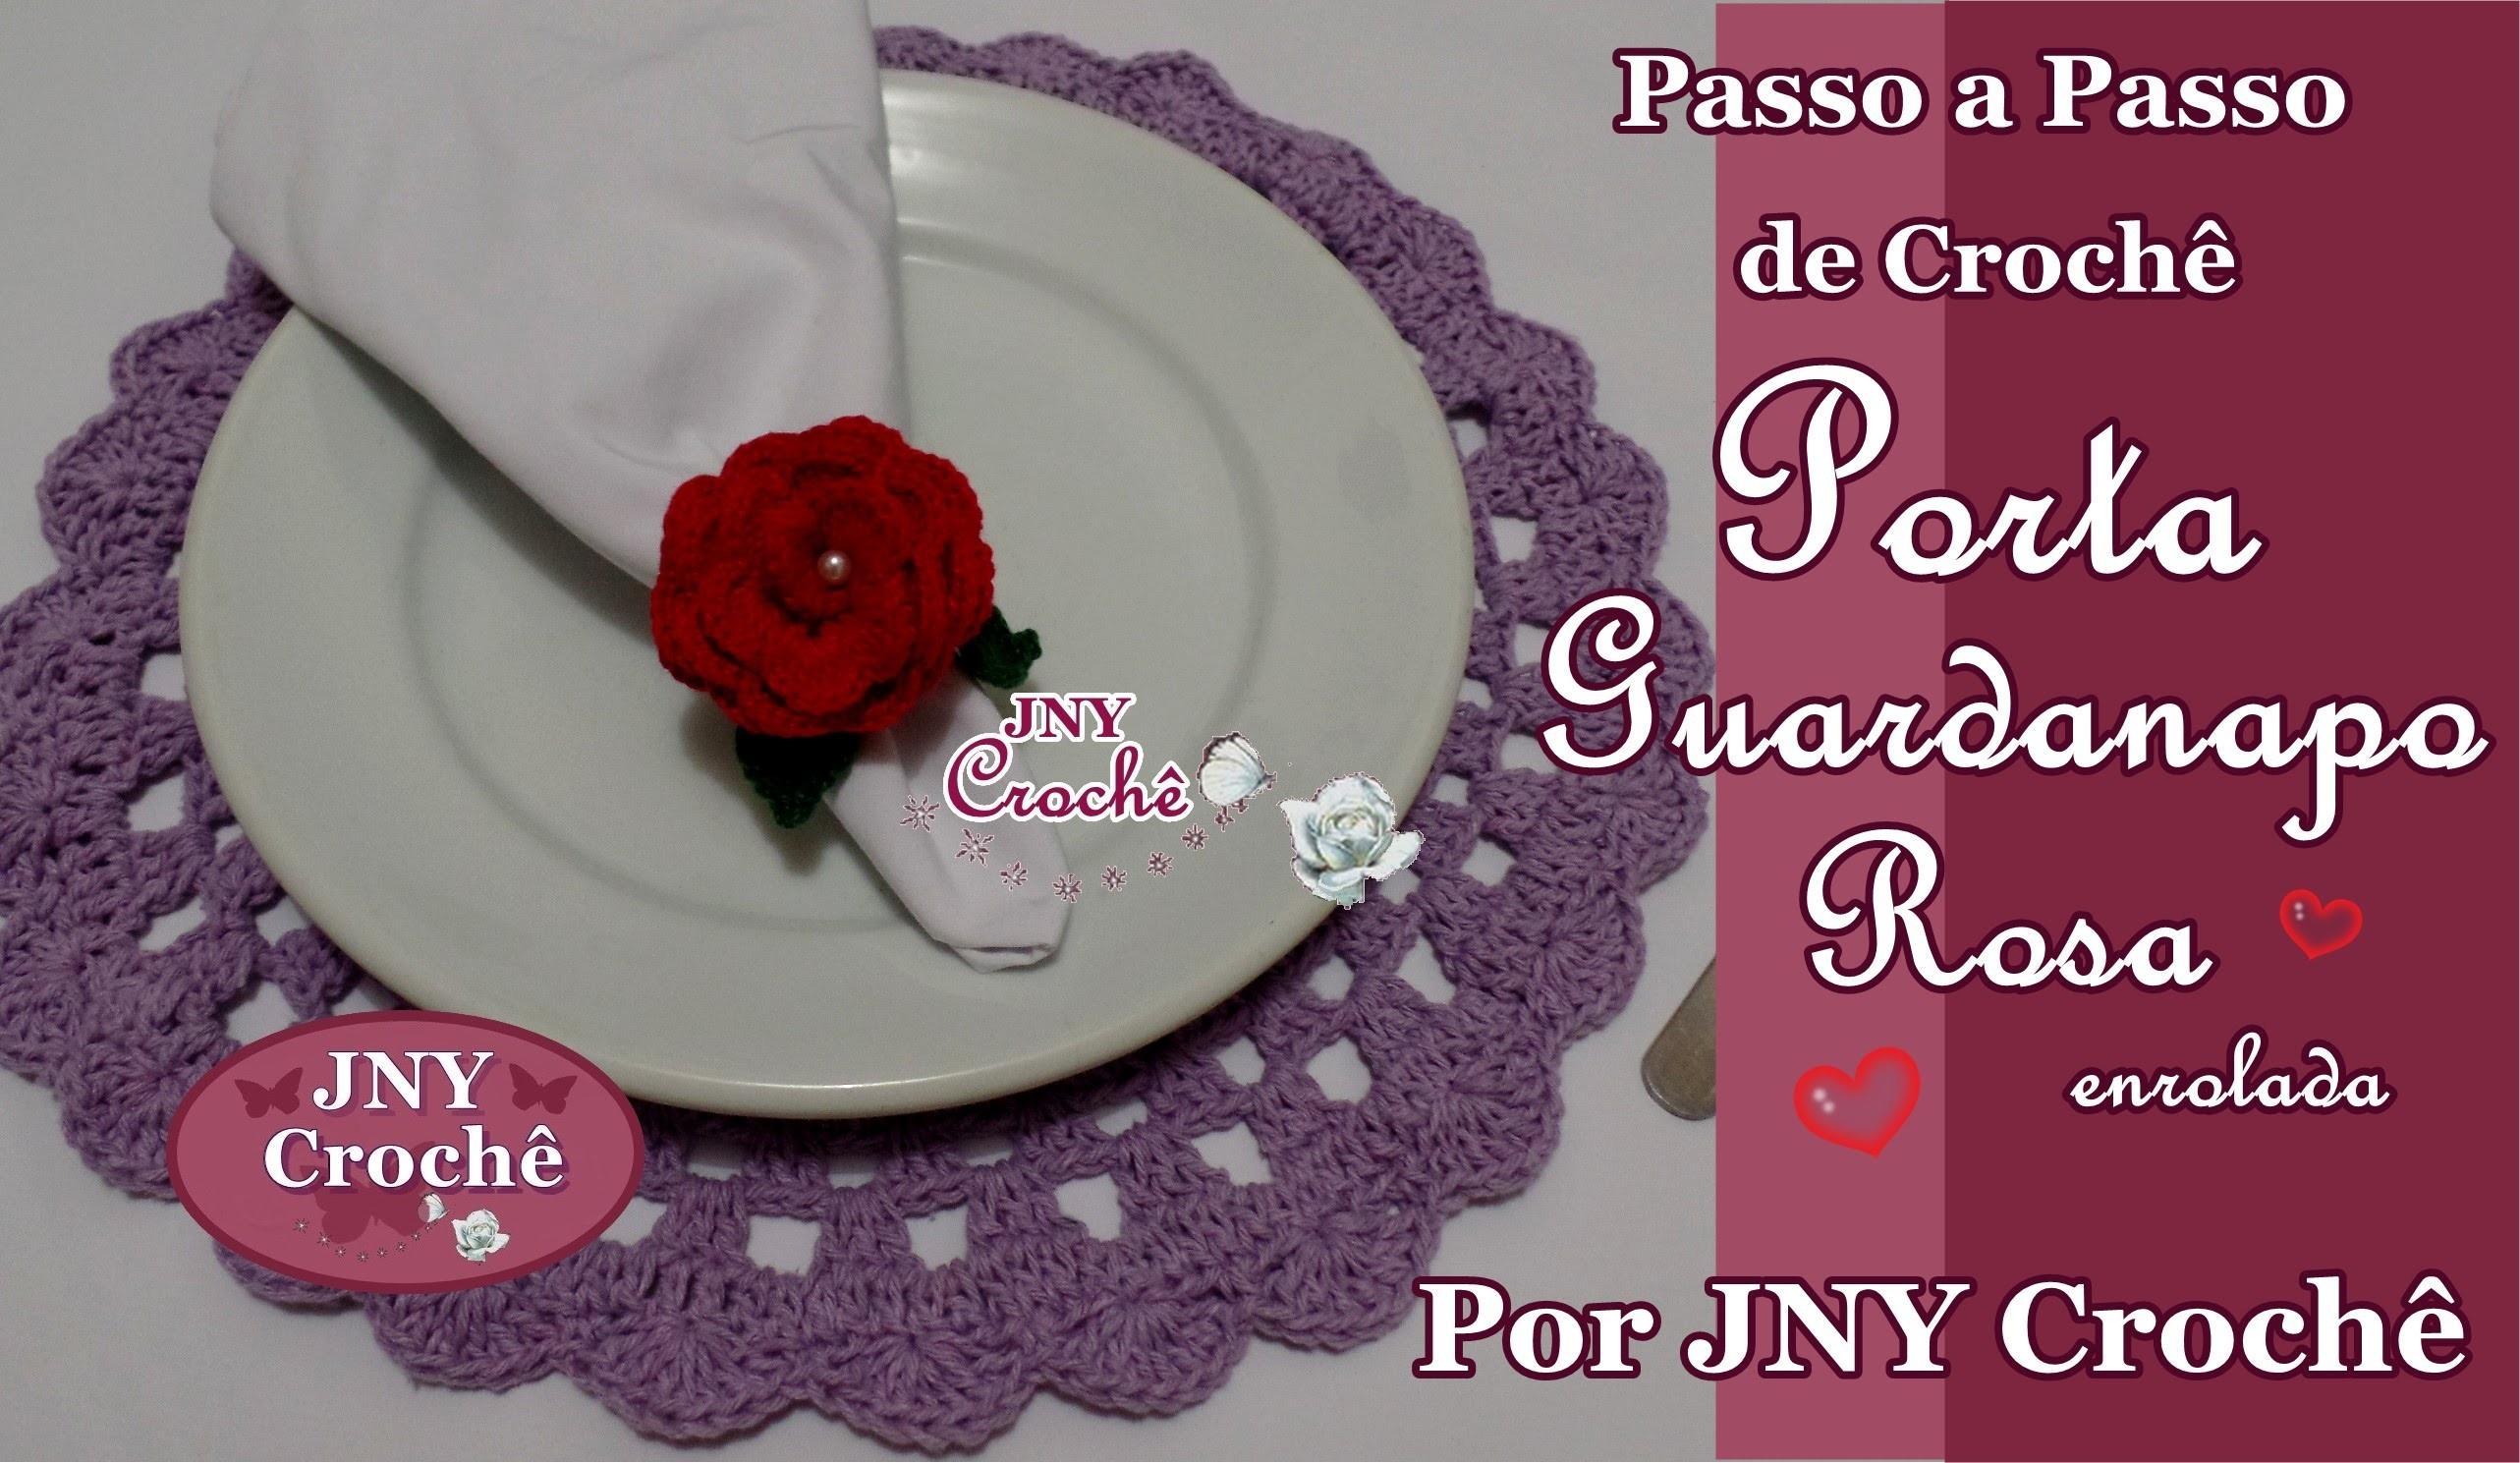 Passo a Passo Porta Guardanapo de Crochê Flor Rosa Enrolada por JNY Crochê